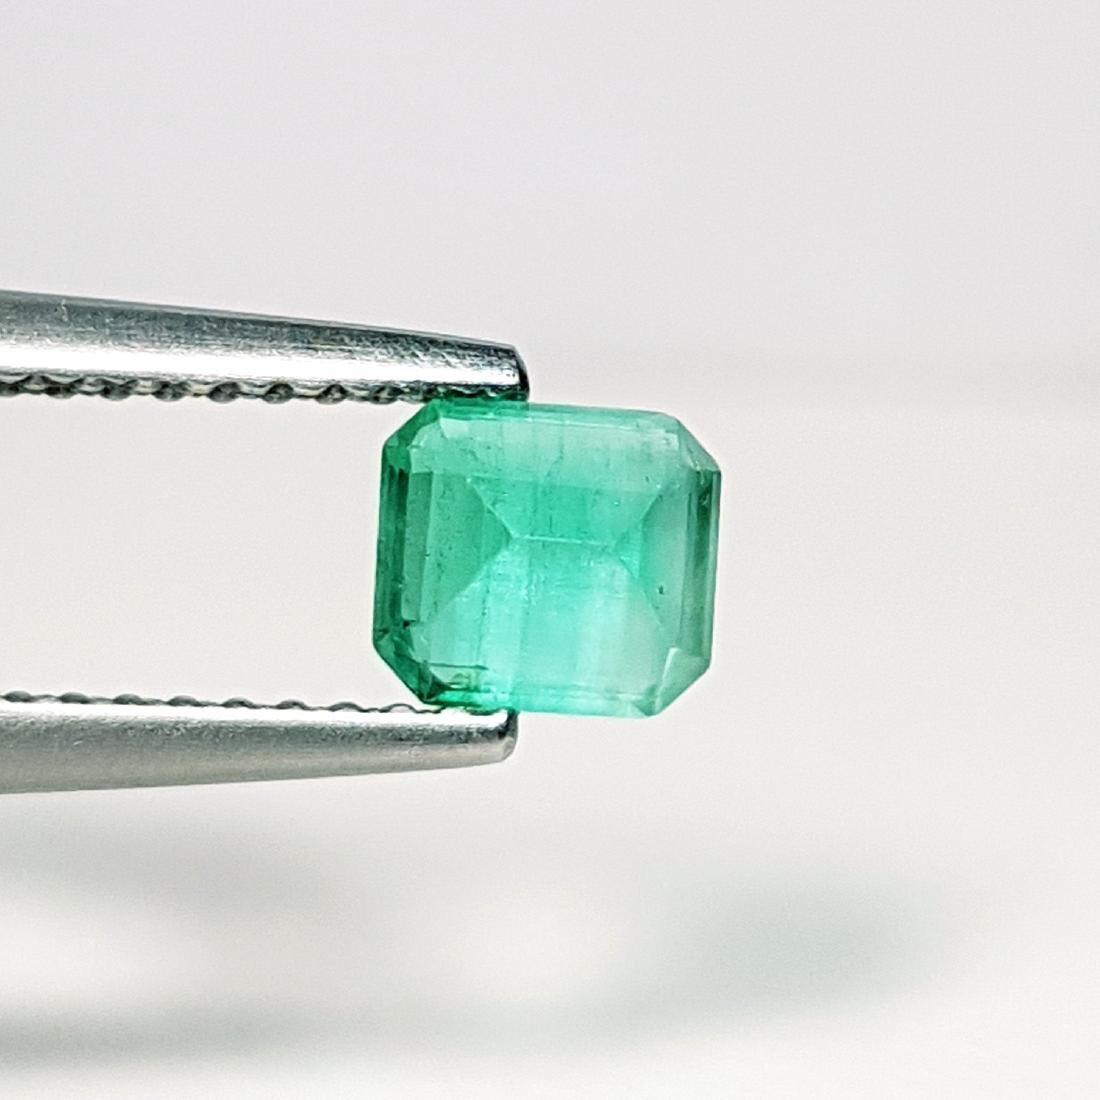 Top Qaulity Emerald Cut NaturalEmerald - 0.63 ct - 4